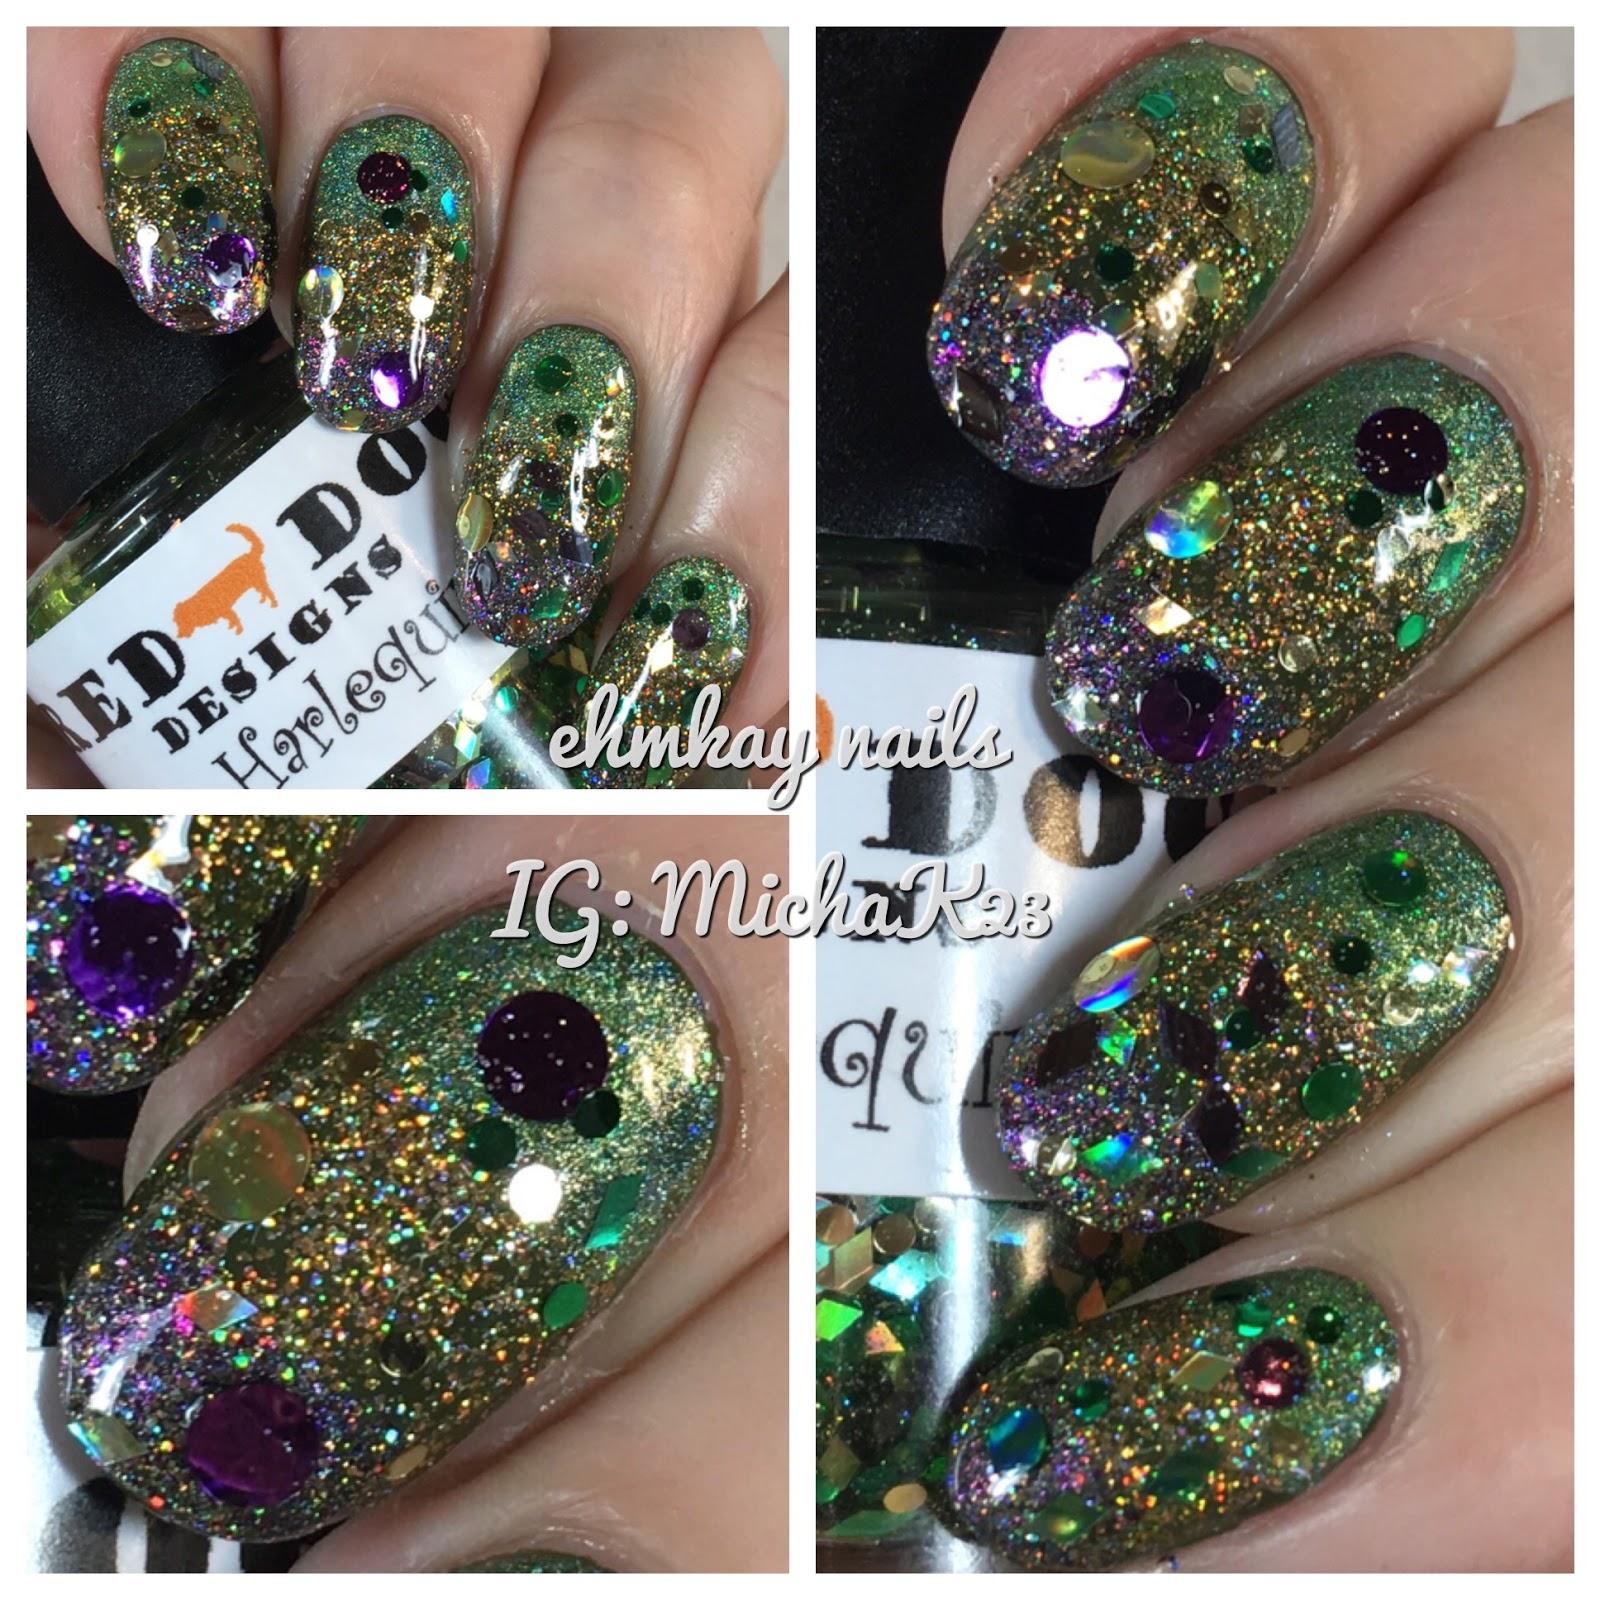 Ehmkay Nails Mardi Gras Nail Art Glitter Stripes With Indie Polish